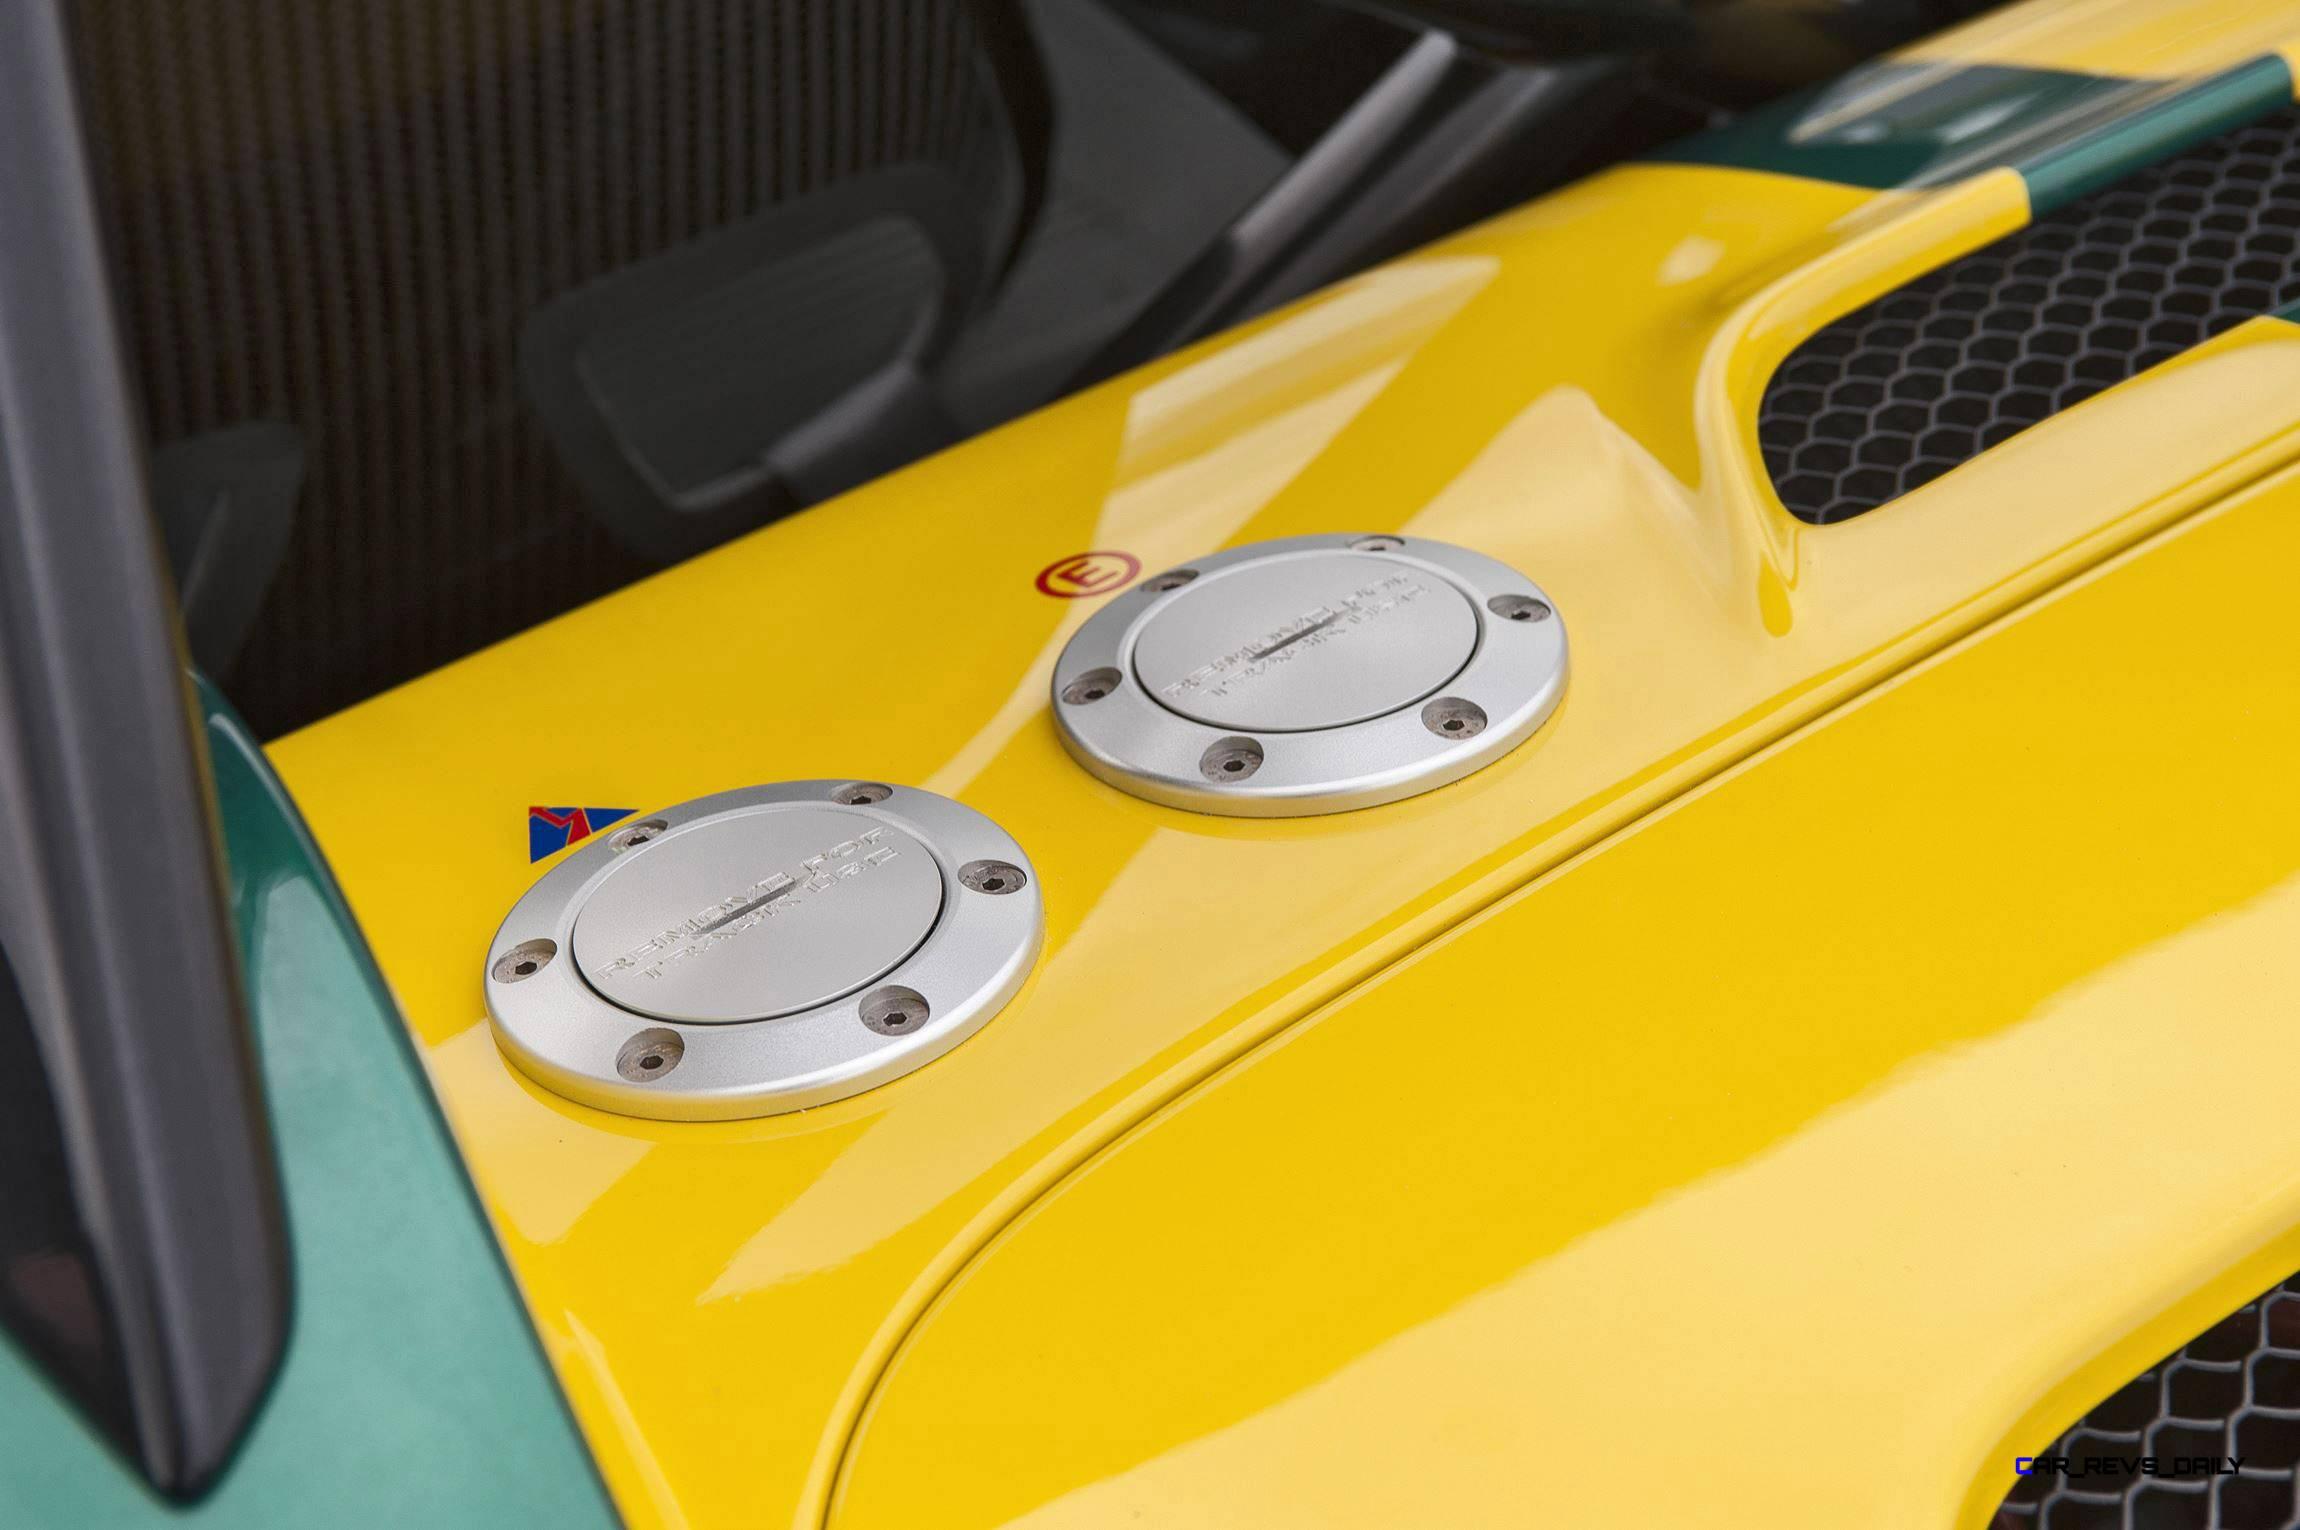 http://www.car-revs-daily.com/wp-content/uploads/2015/06/2016-Lotus-3-Eleven-6.jpg